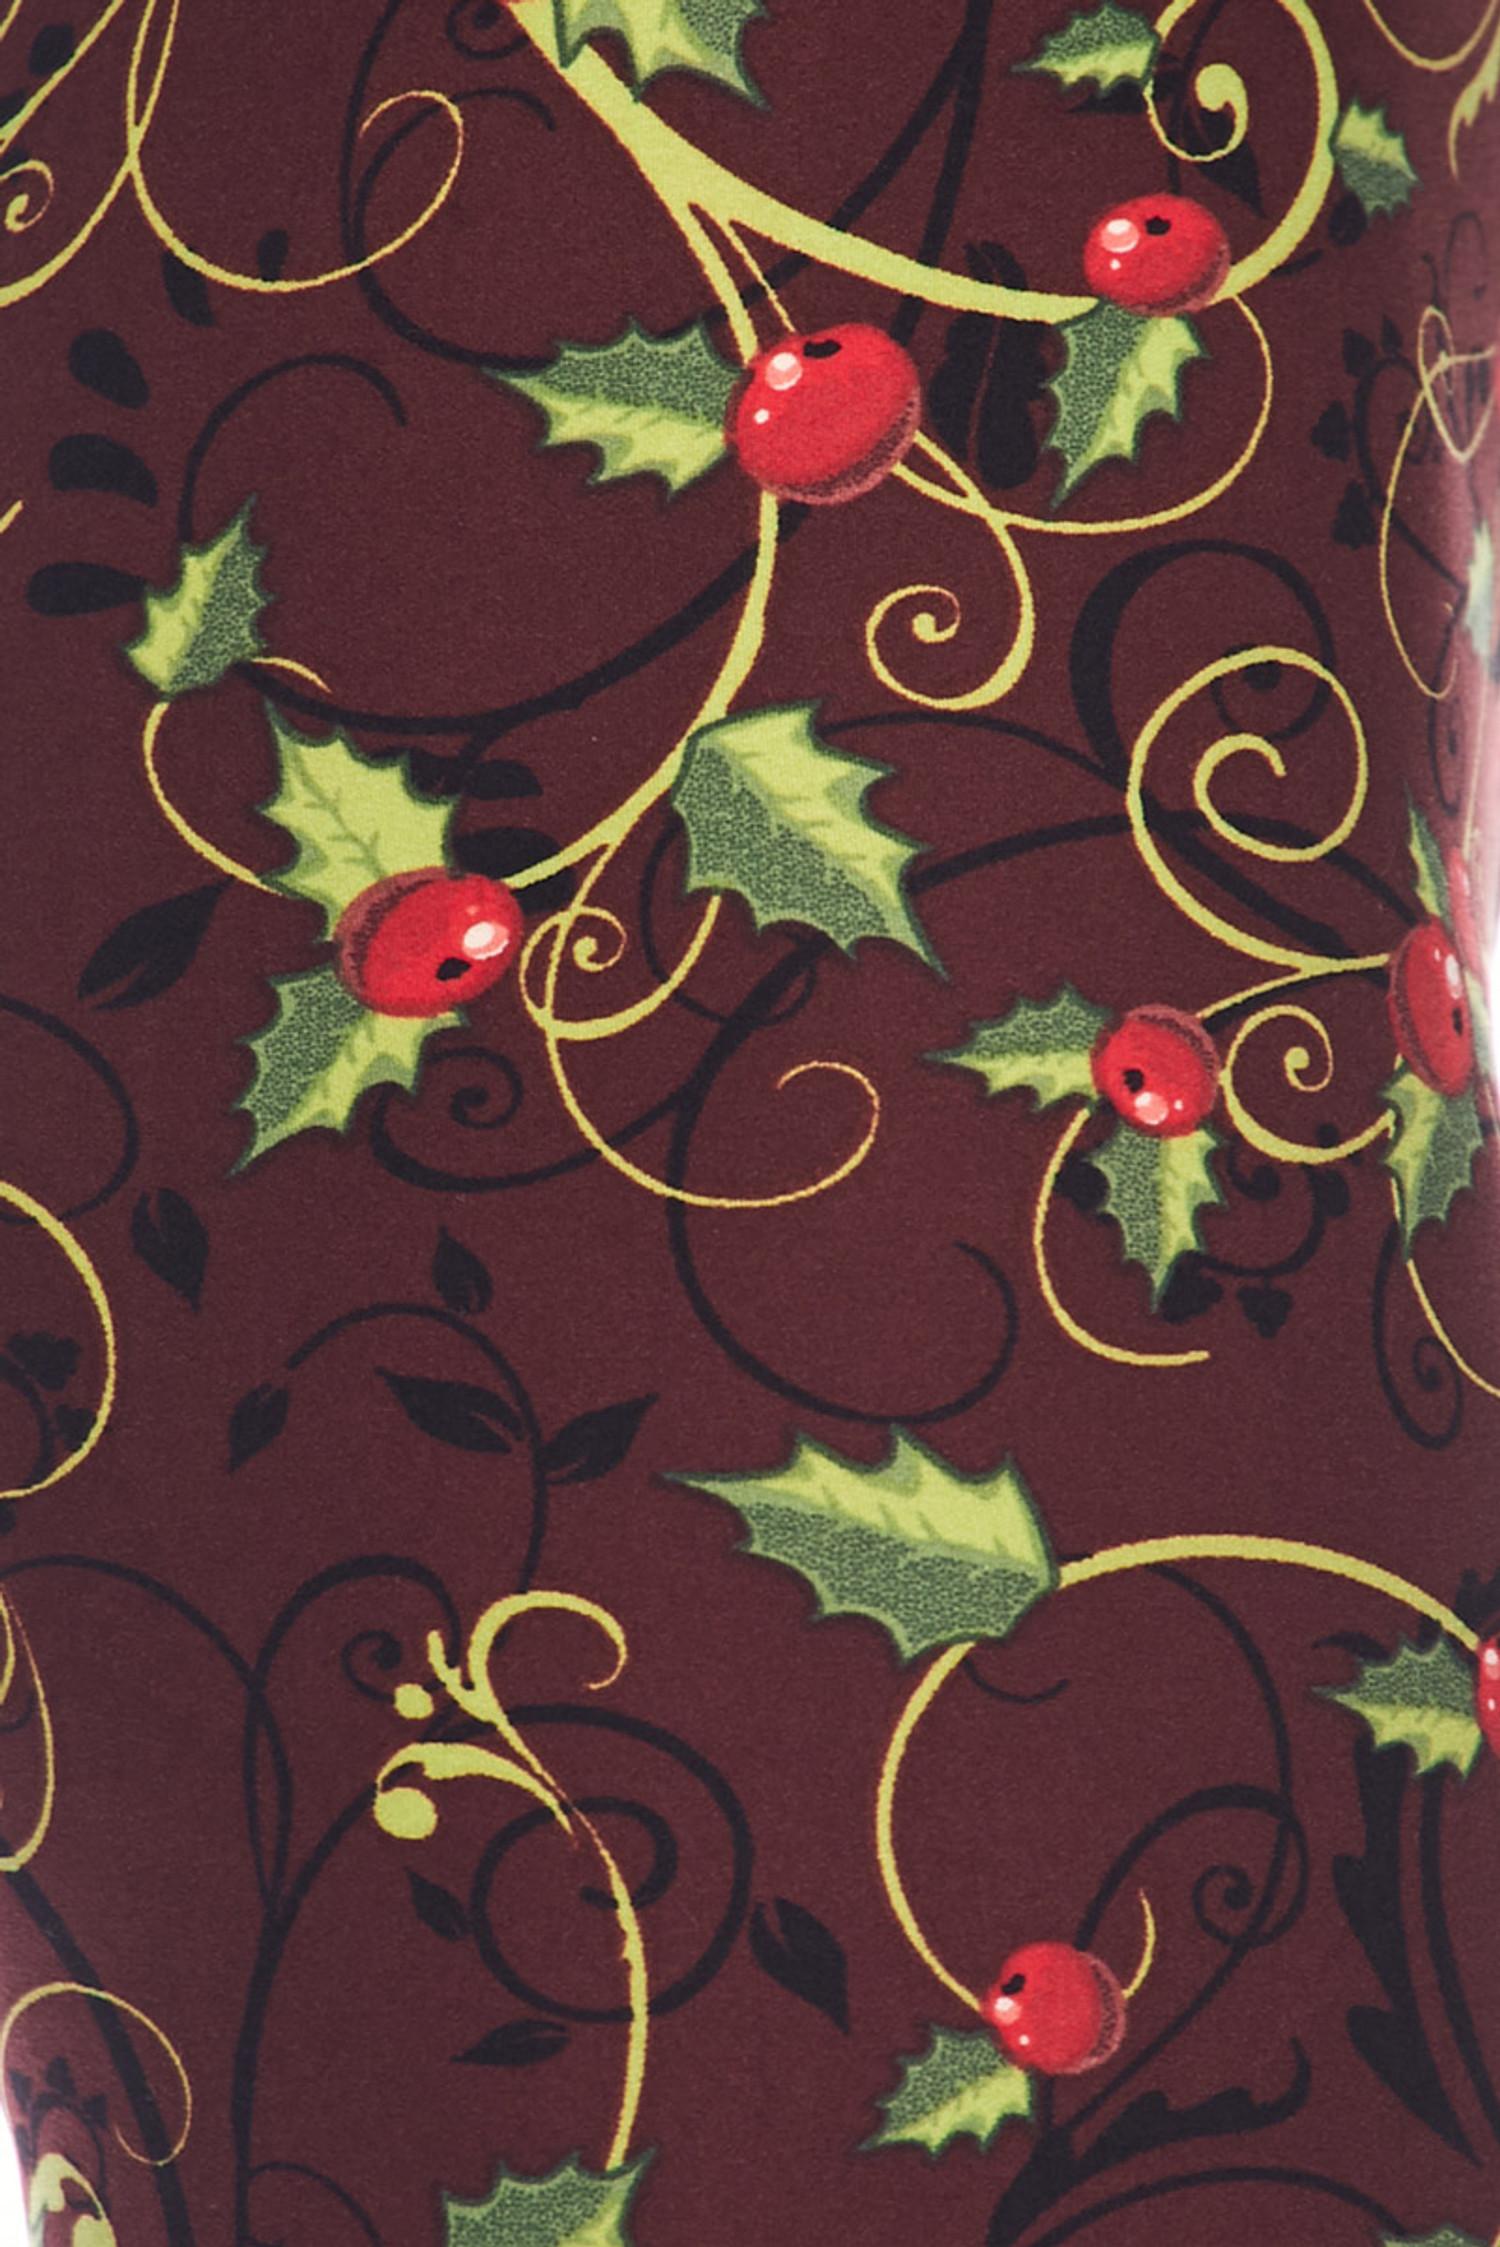 Brushed Christmas Holly Leggings